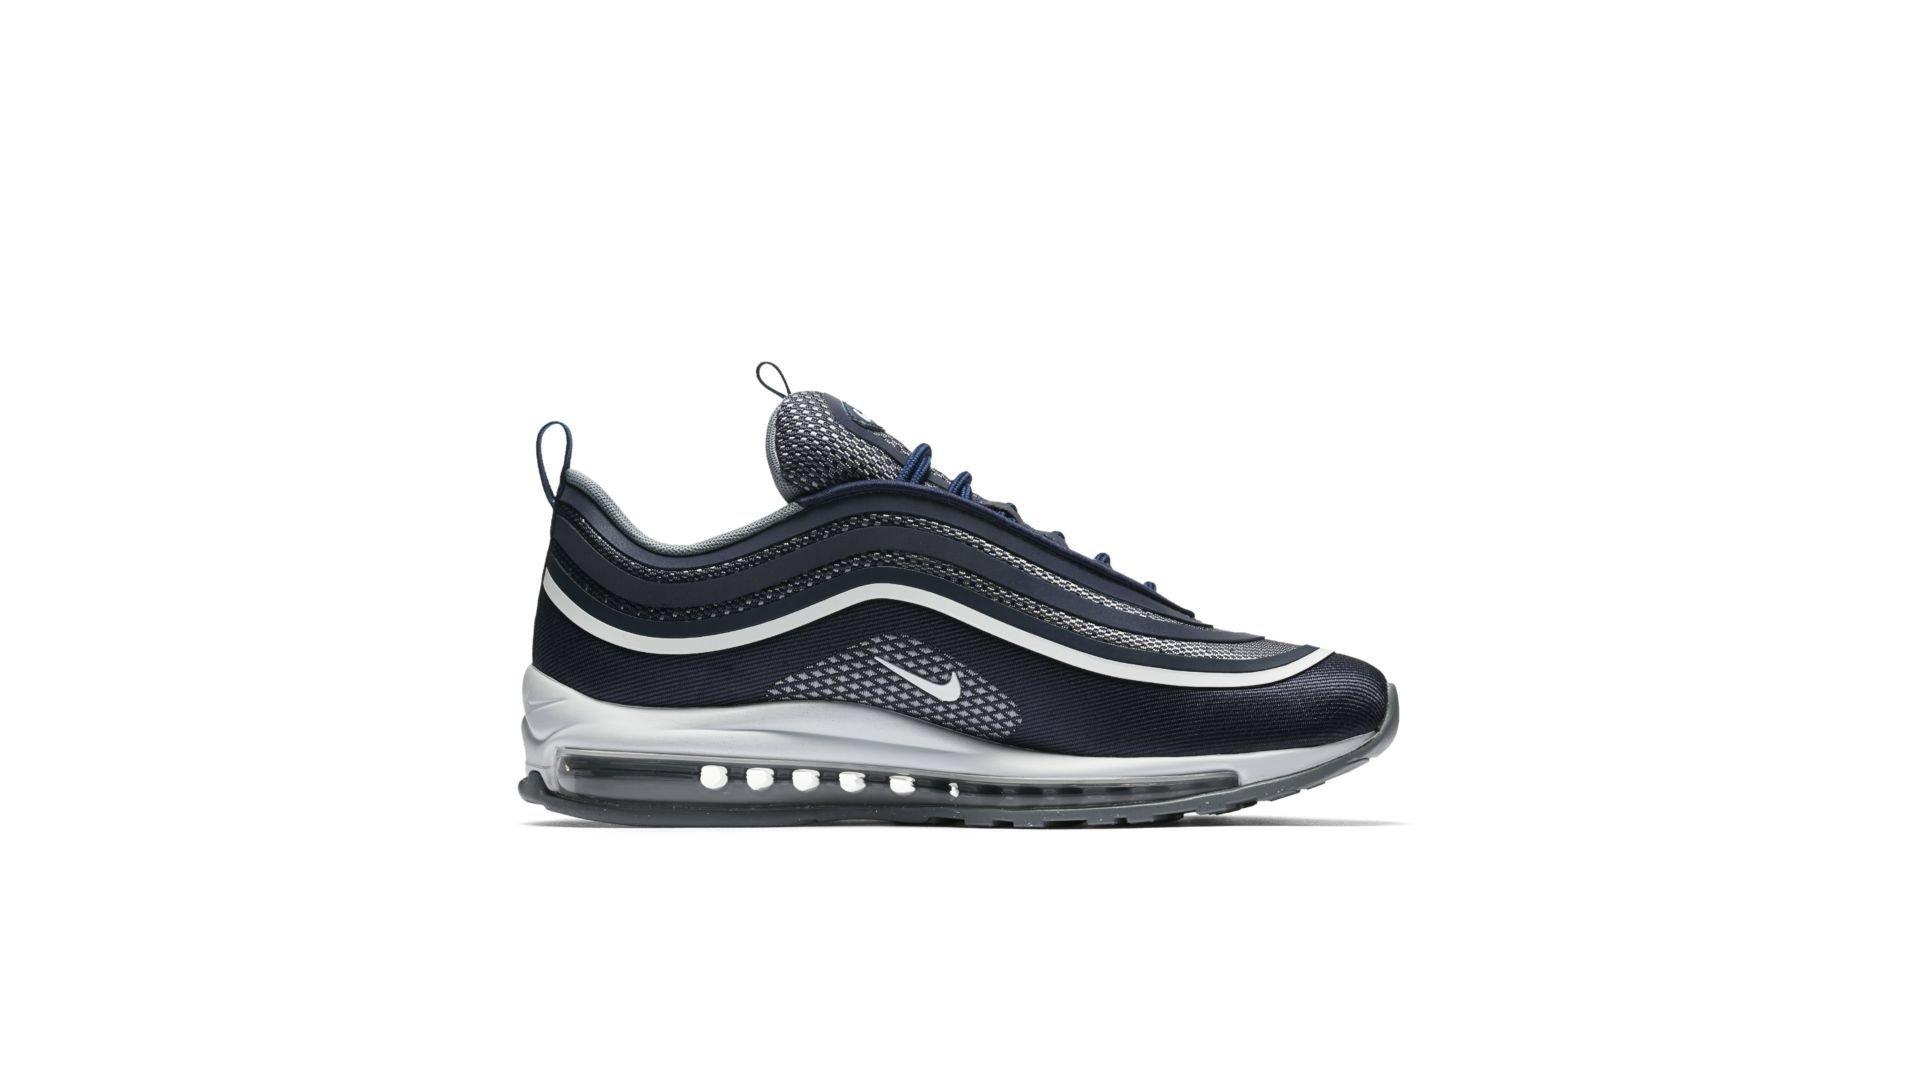 Nike Air Max 97 Ultra 17 Midnight Navy (918356-400)